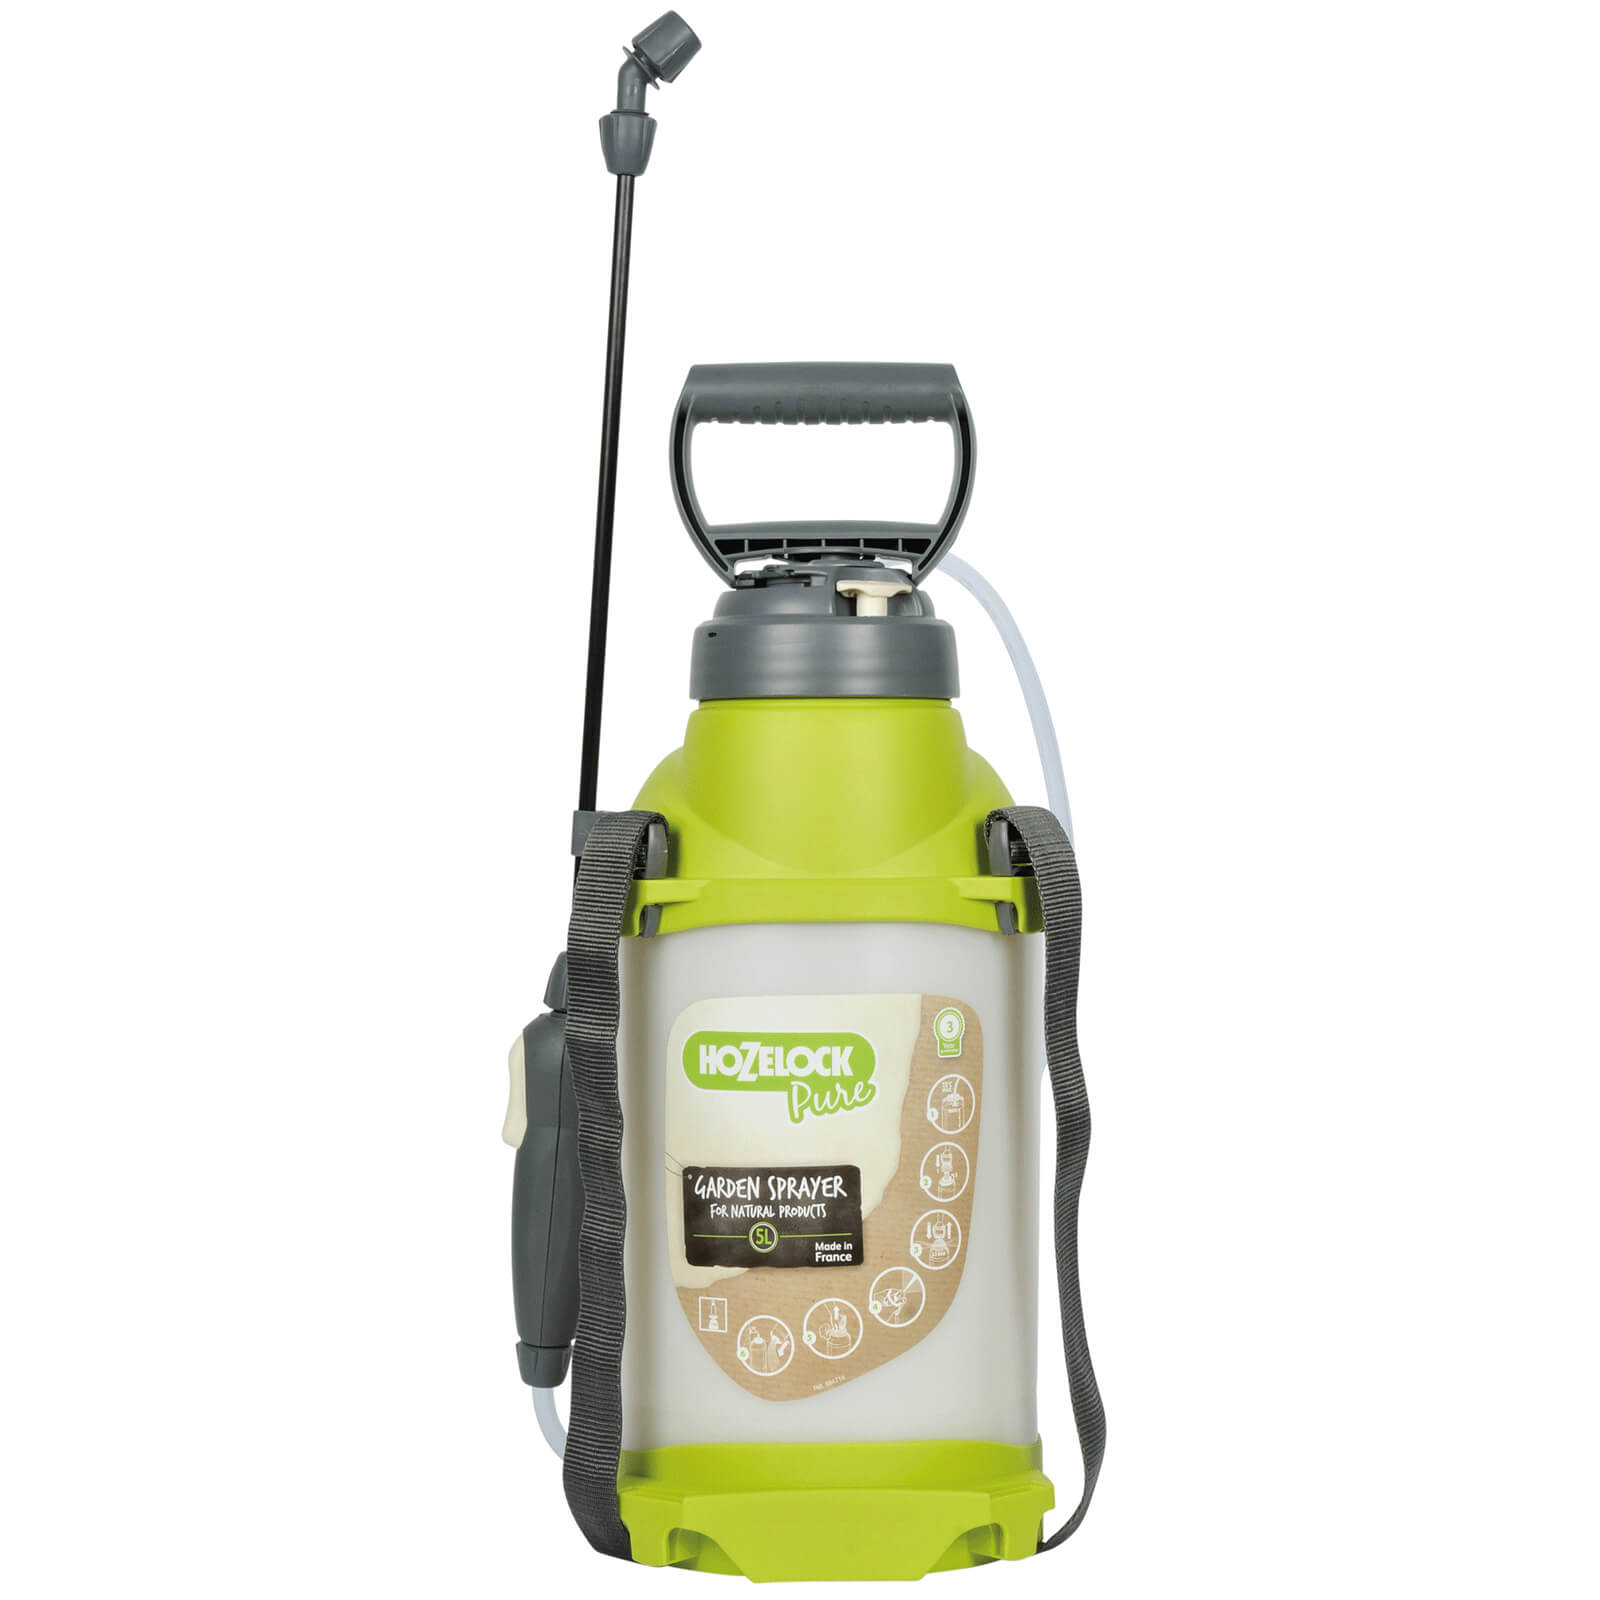 Hozelock Pure Water Pressure Sprayer 7l